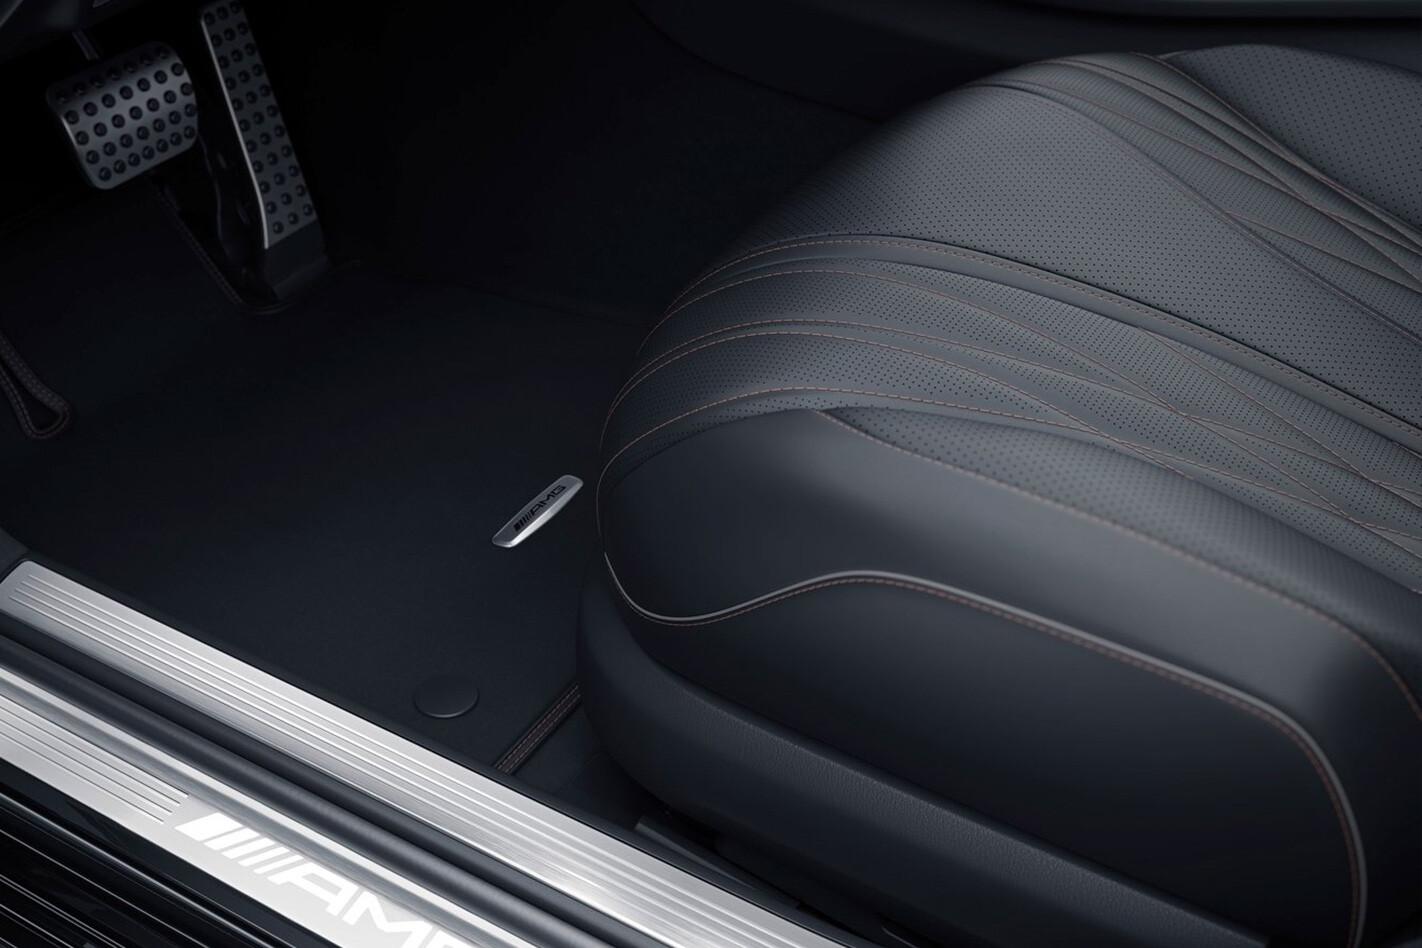 Leather Car Jpg